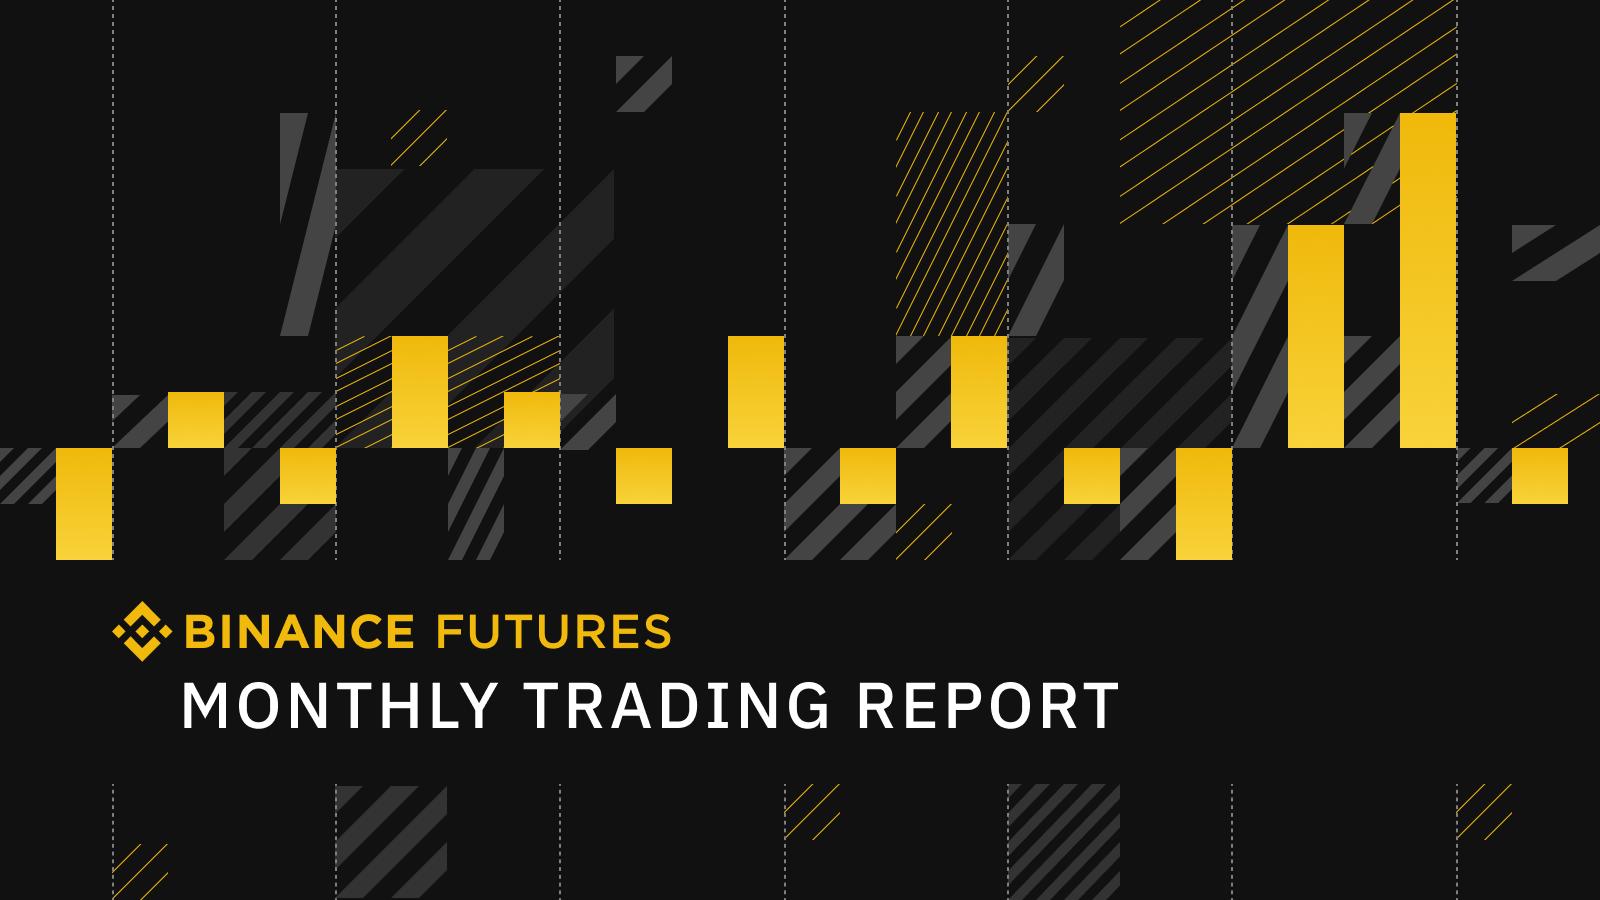 tradând futures bitcoin pe brokeri interactivi